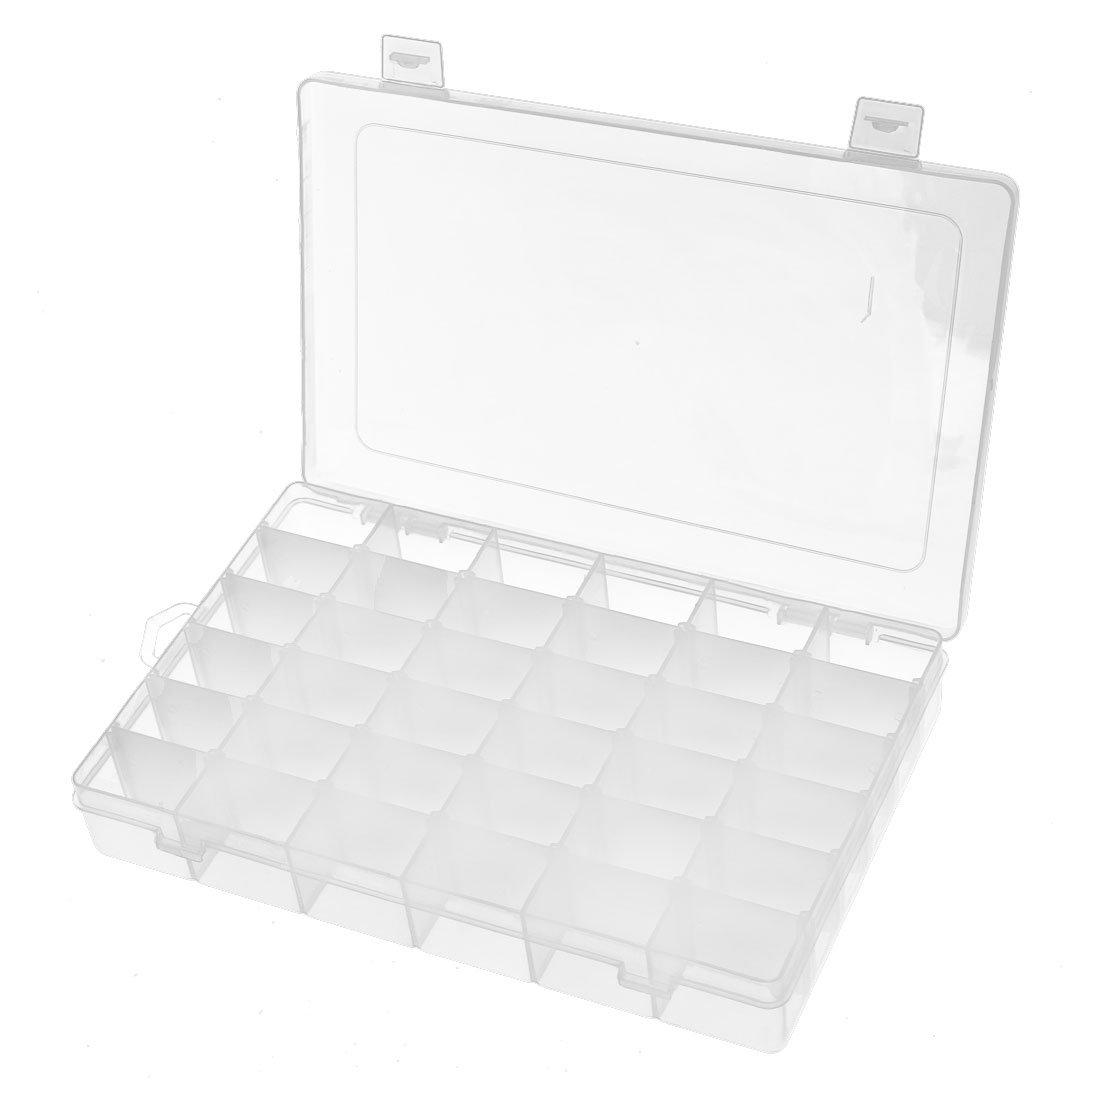 uxcell 273mmx175mmx45mm 36 Slots Component Storage Organizer Case DIY Tool Clear